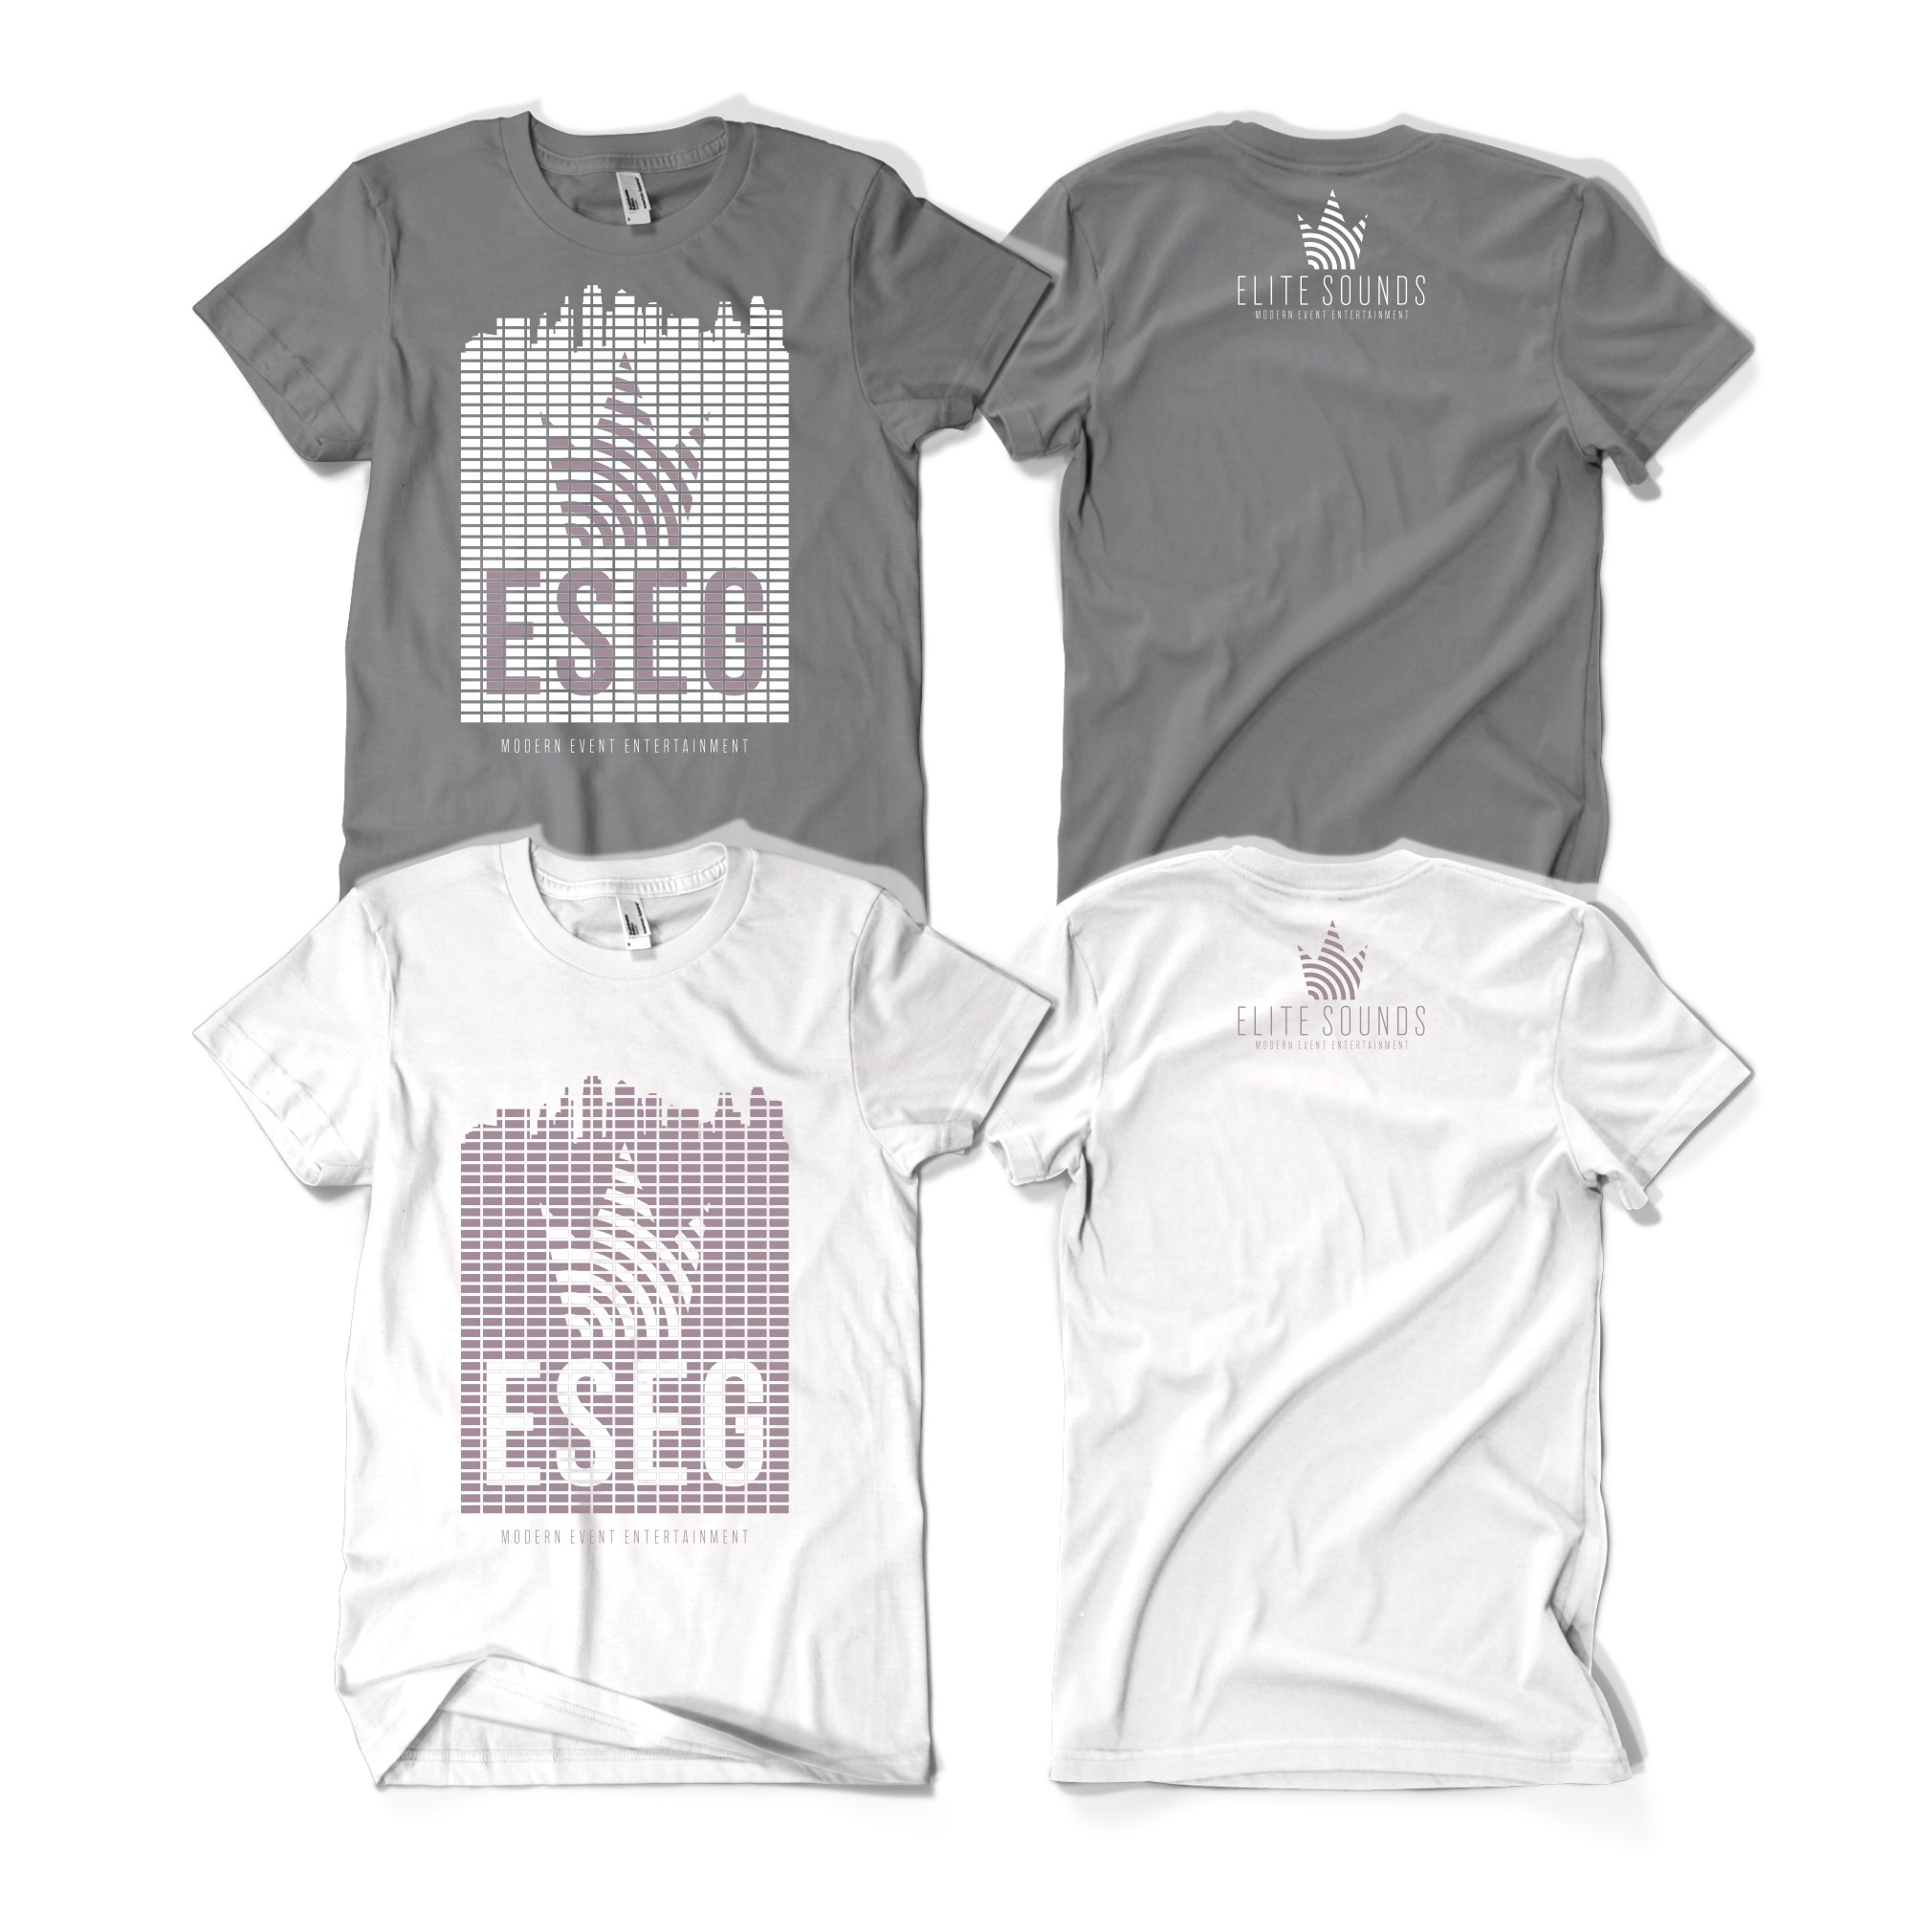 Trendy T Shirt Design For High End DJ, Event Lighting Company